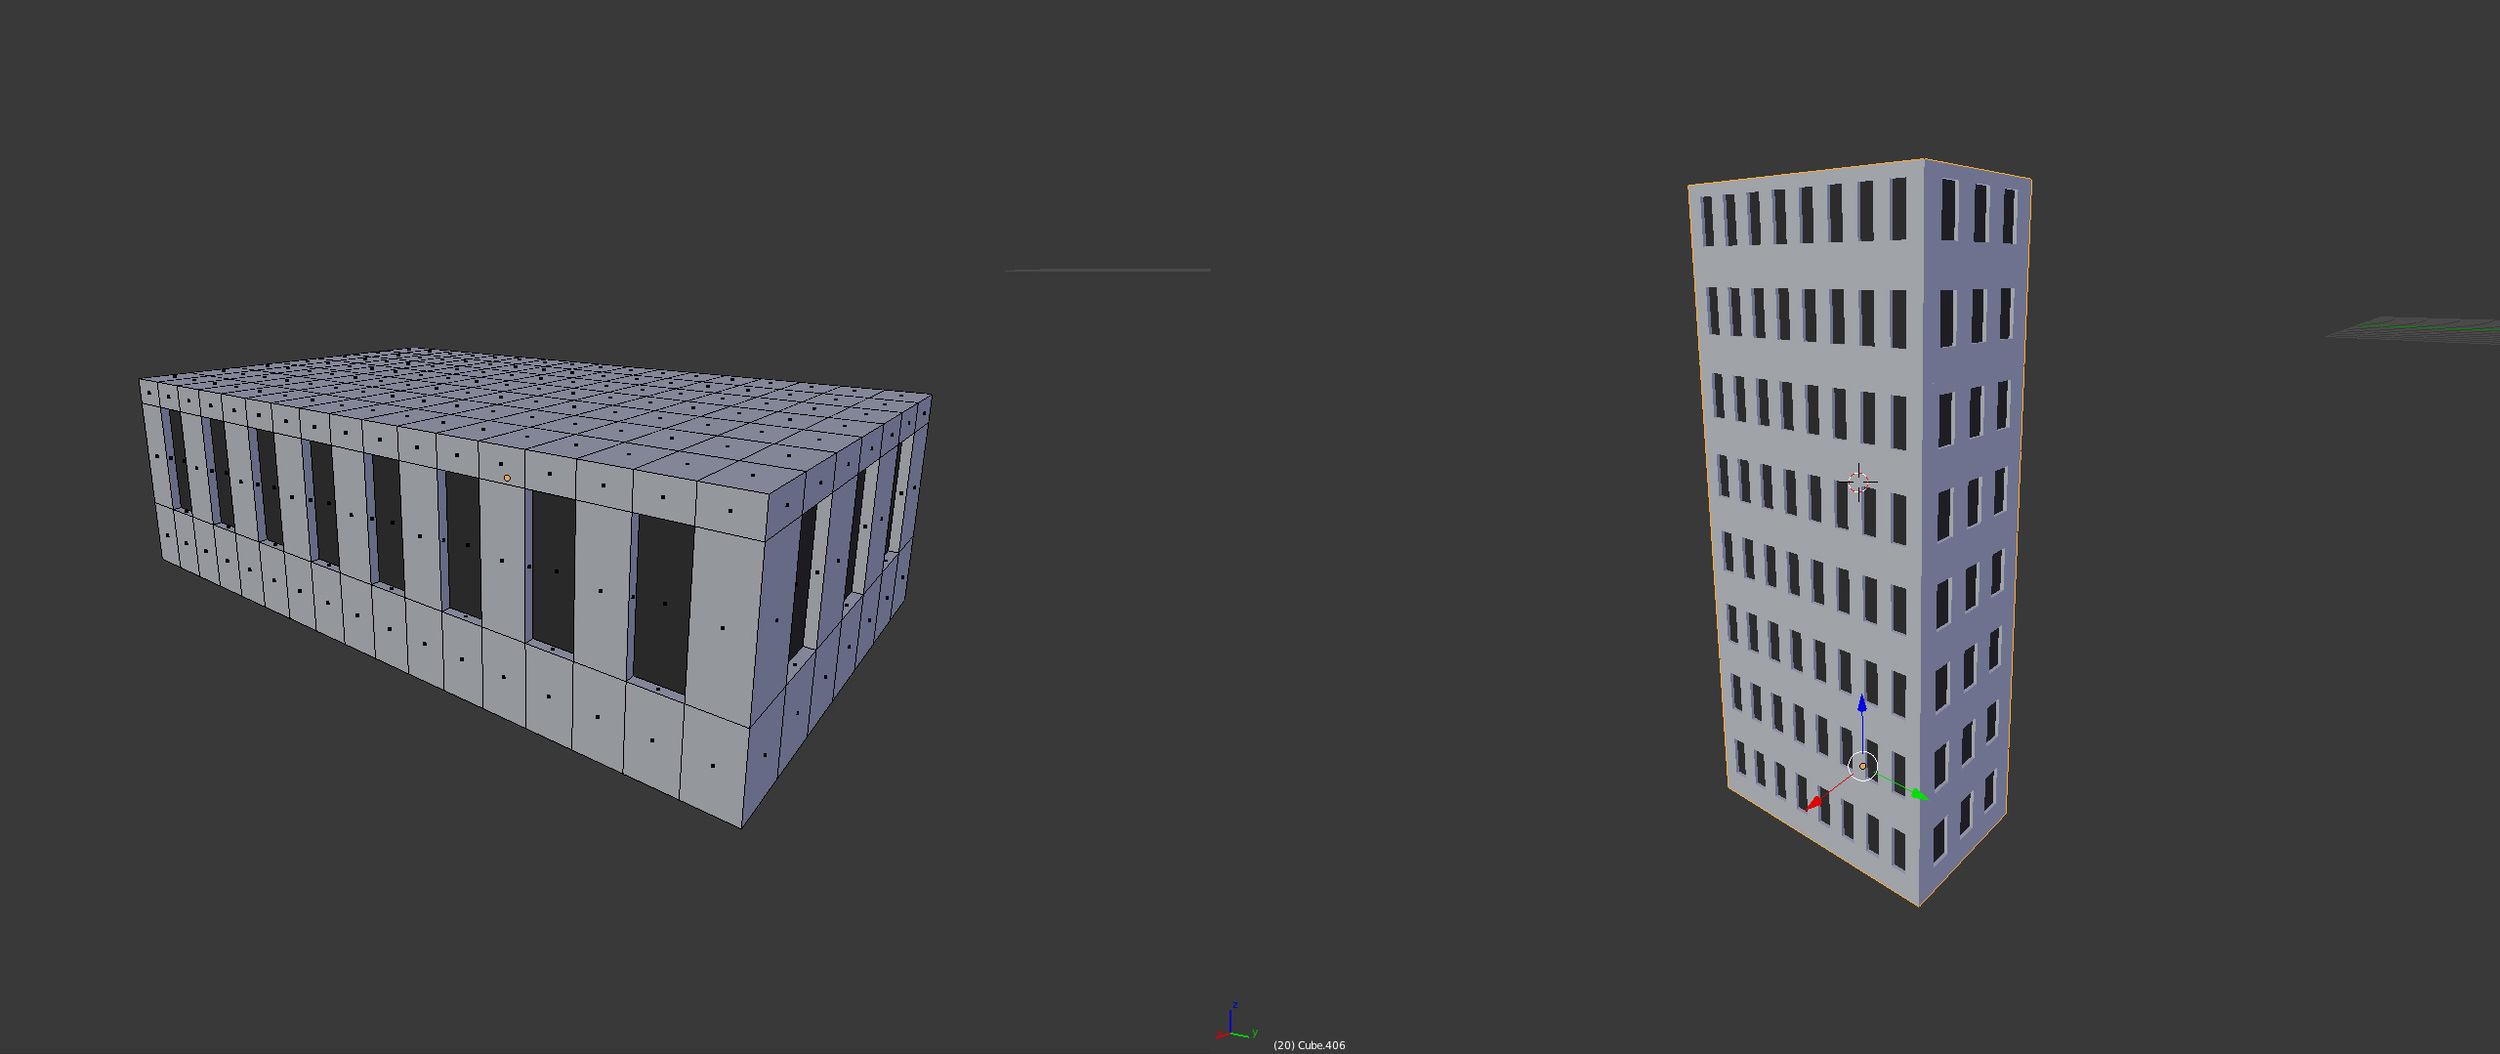 Simple building